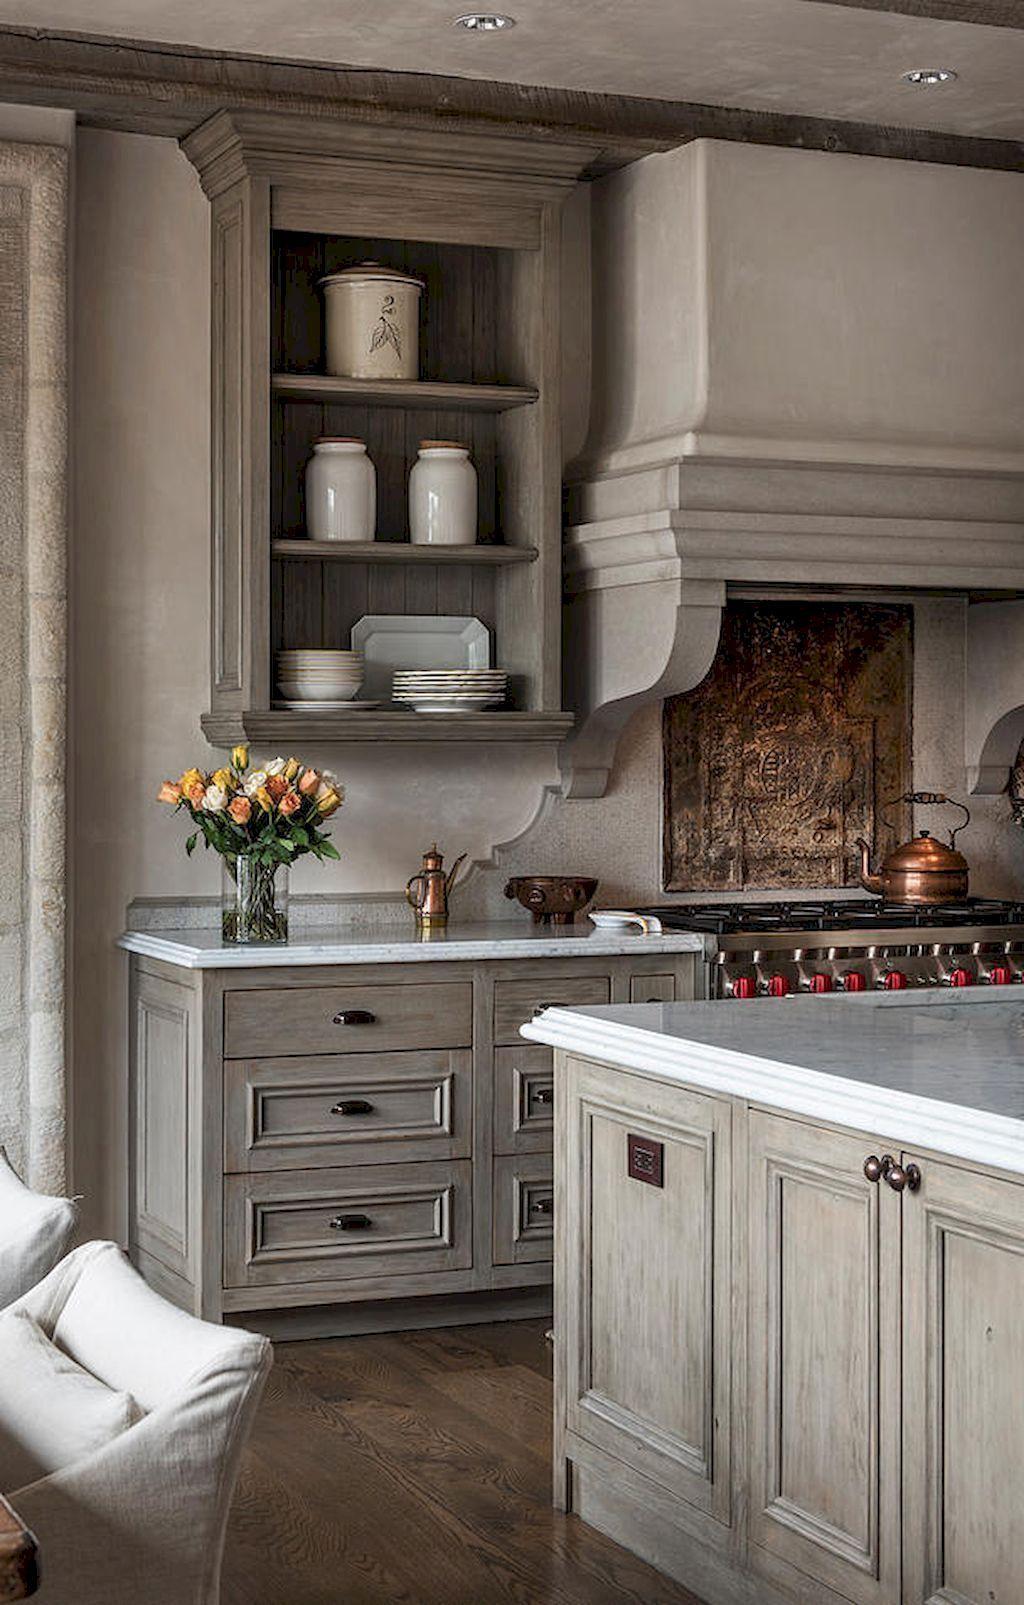 Gorgeous farmhouse kitchen cabinets makeover ideas 53